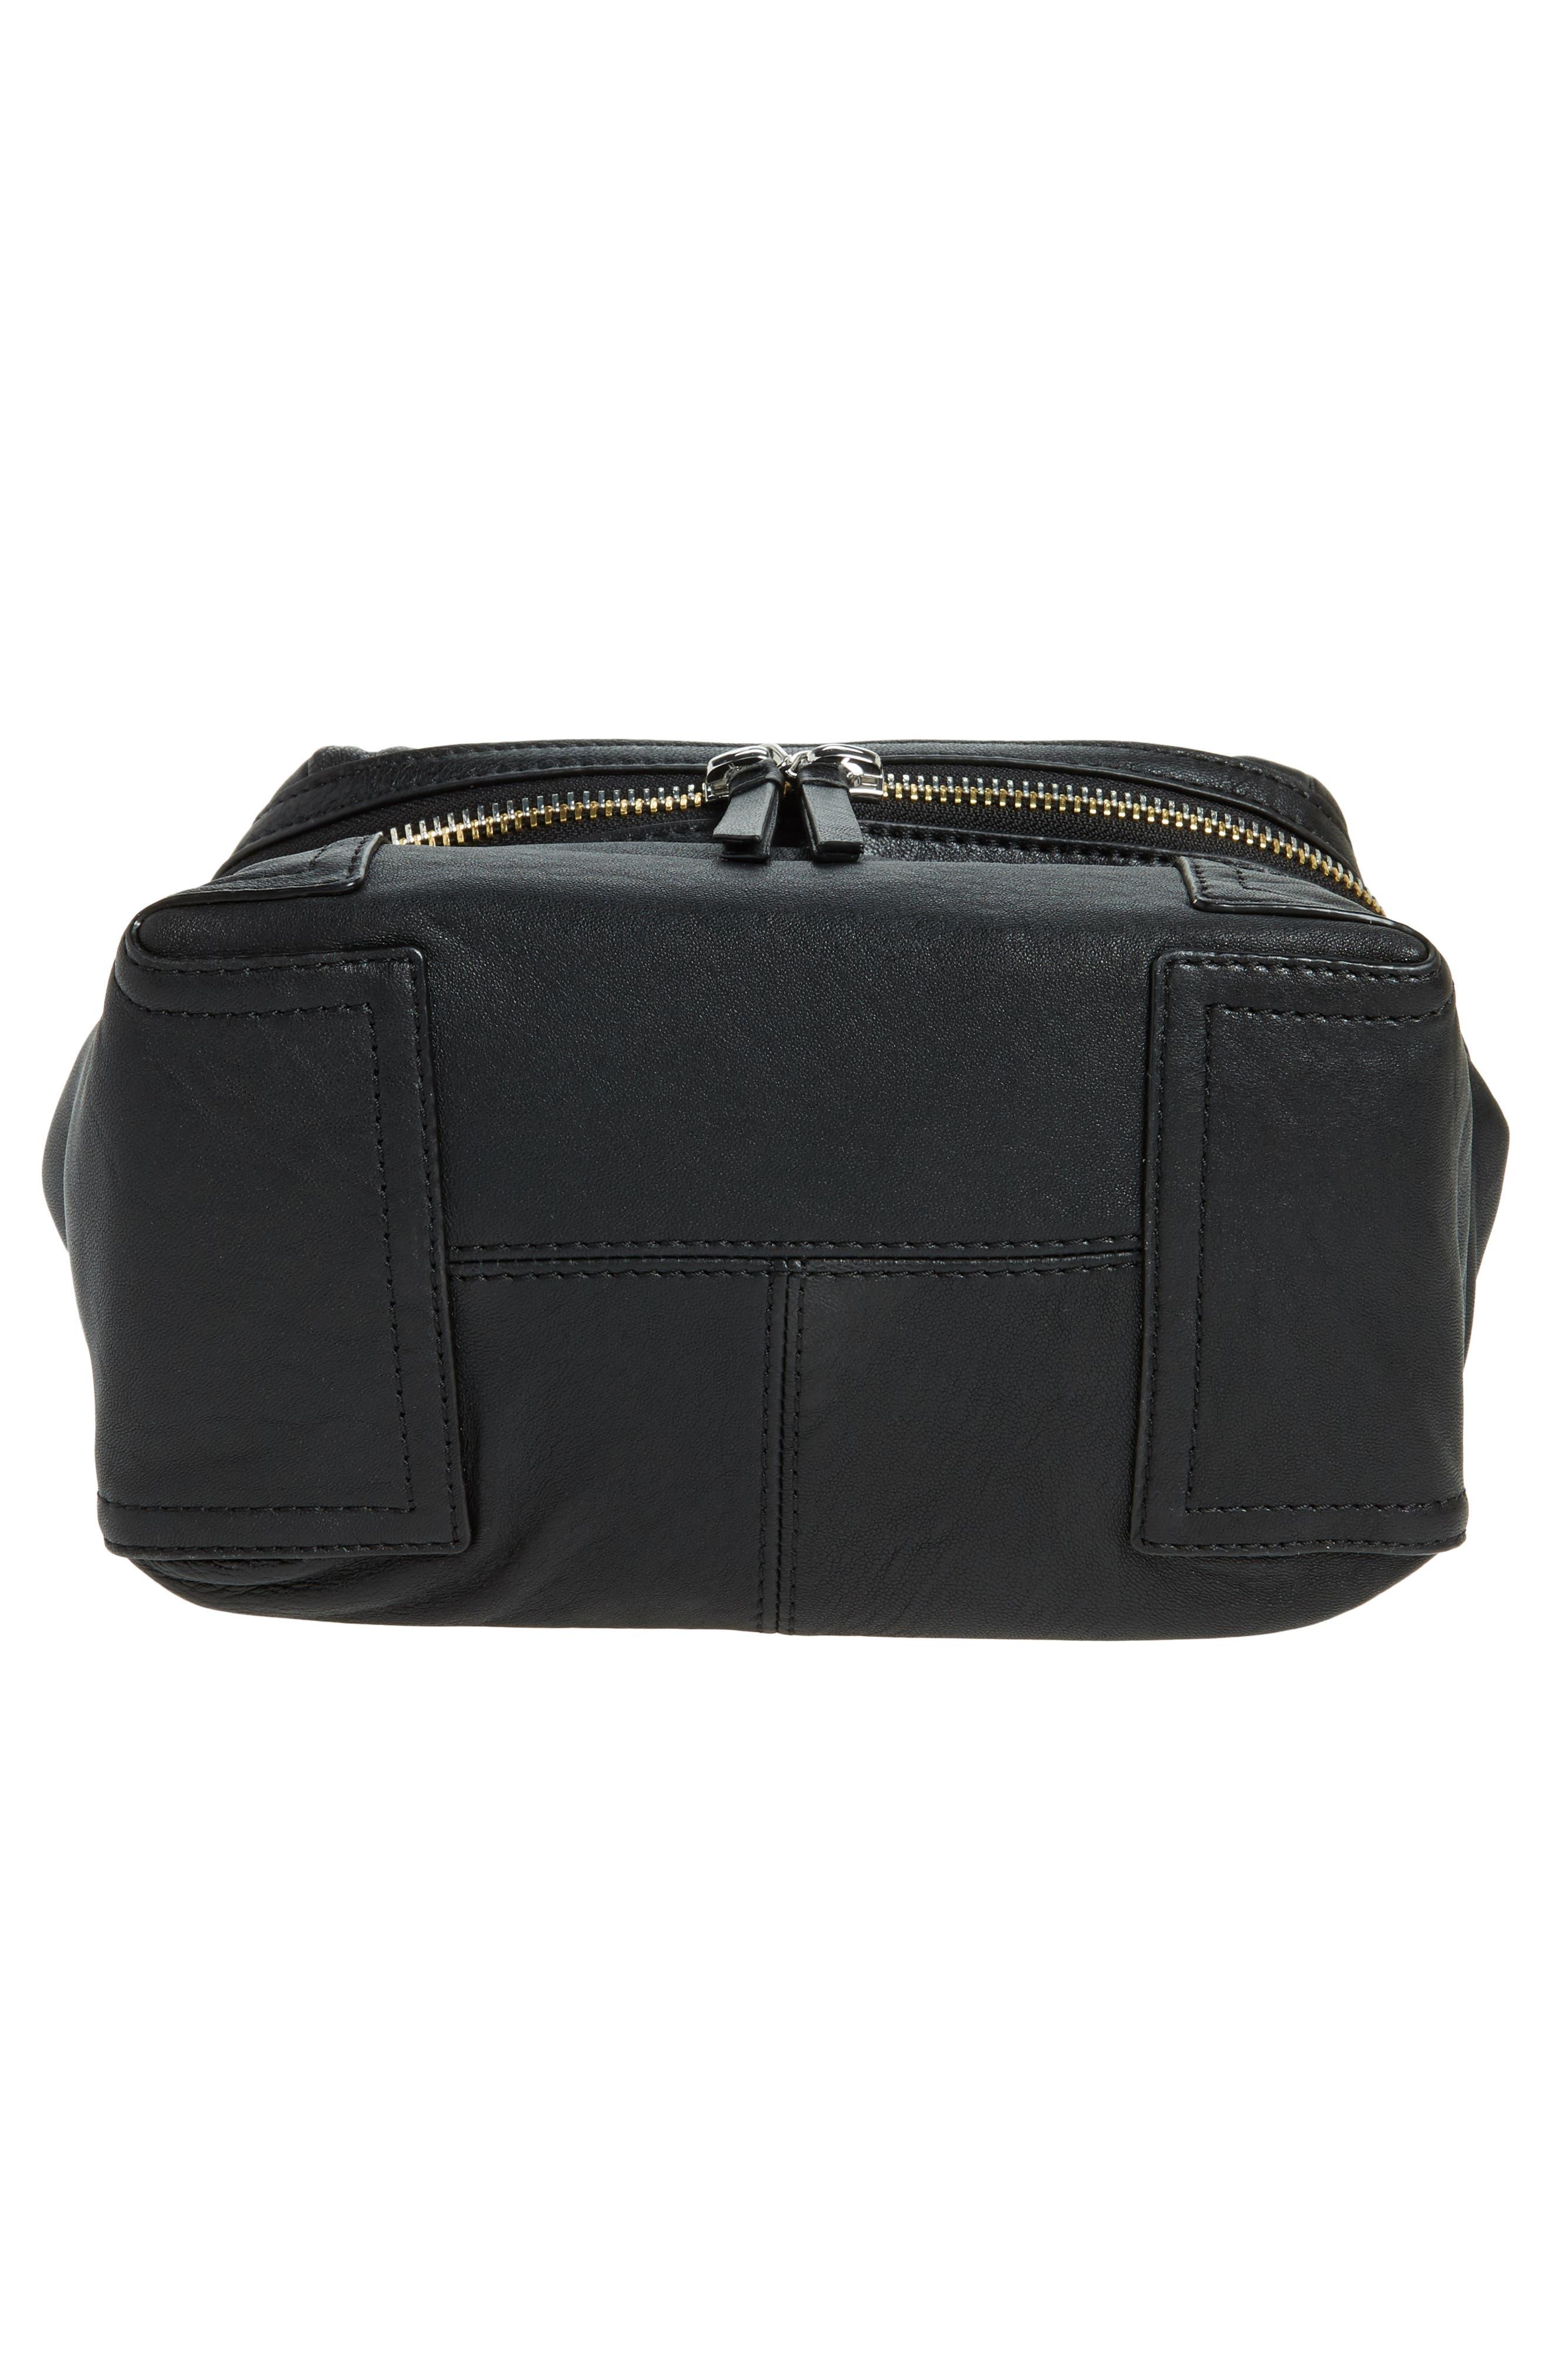 Medium Patch Leather Crossbody Bag,                             Alternate thumbnail 6, color,                             002